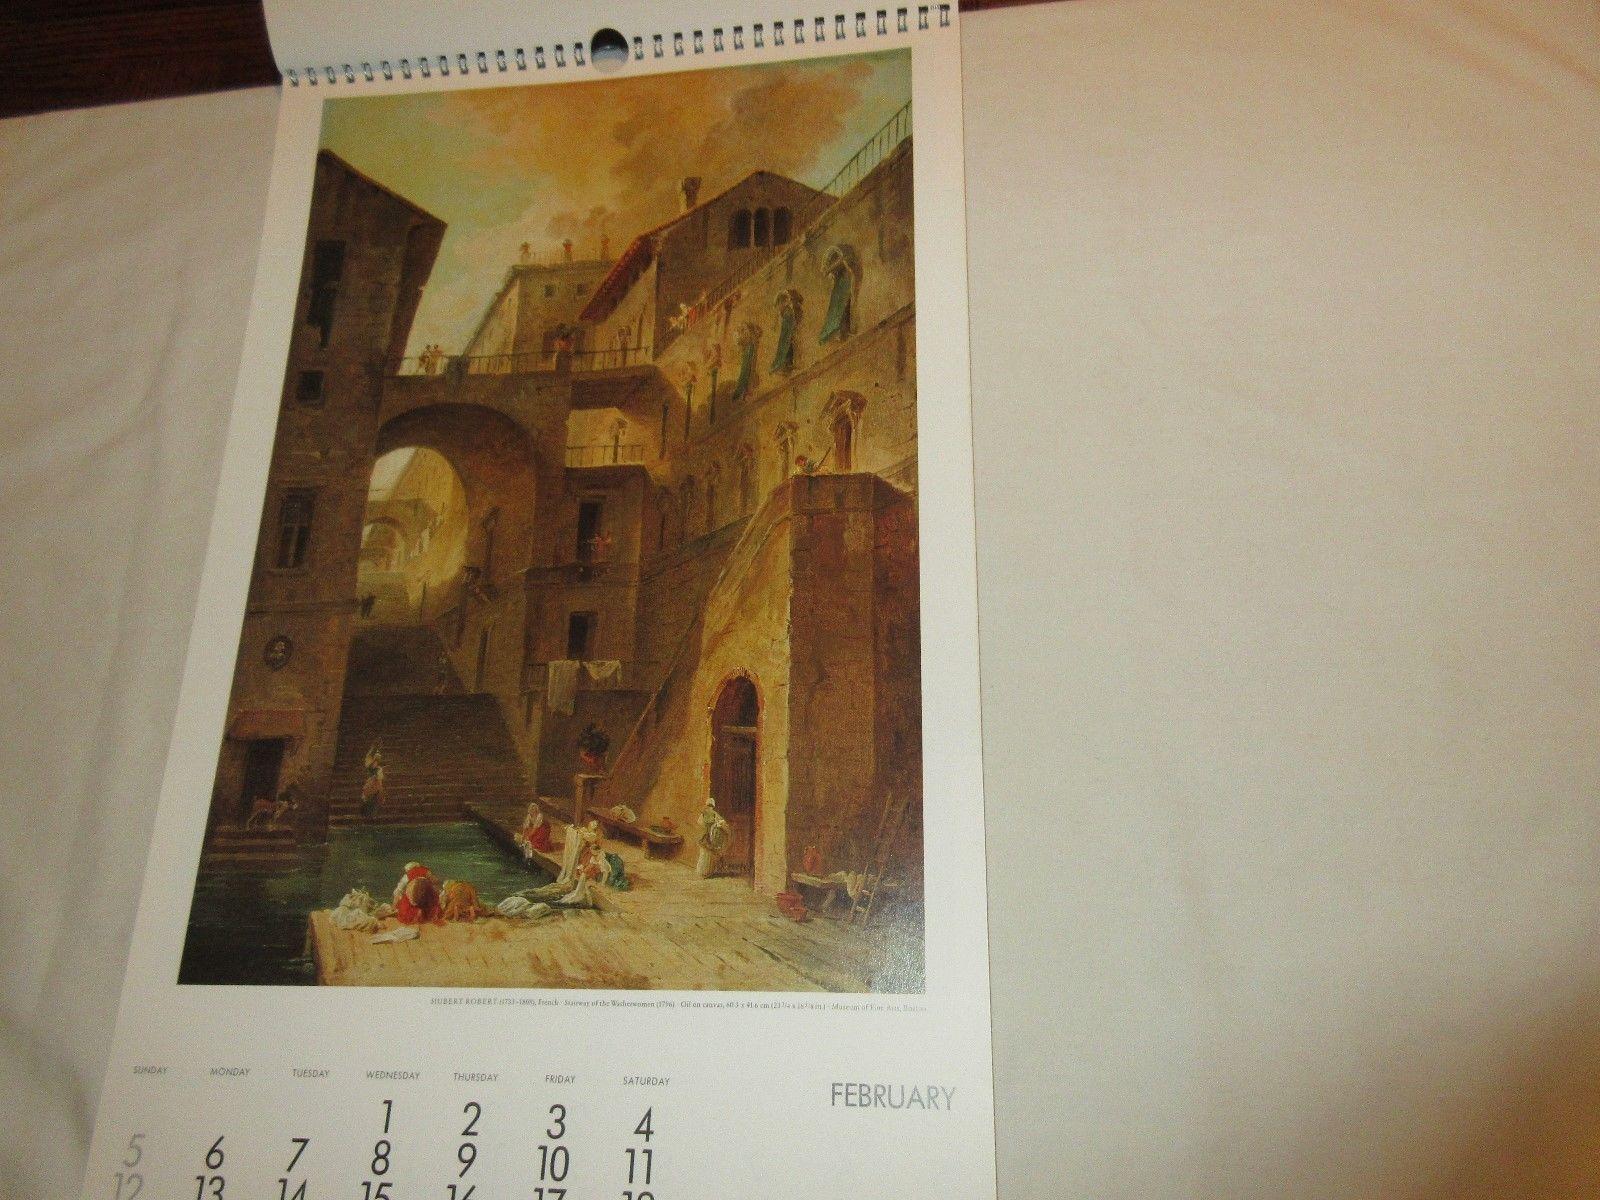 Rx , Pharmacy , Calendar , Hoechst-Roussel Pharmaceuticals Inc.,1989 , Vintage image 3